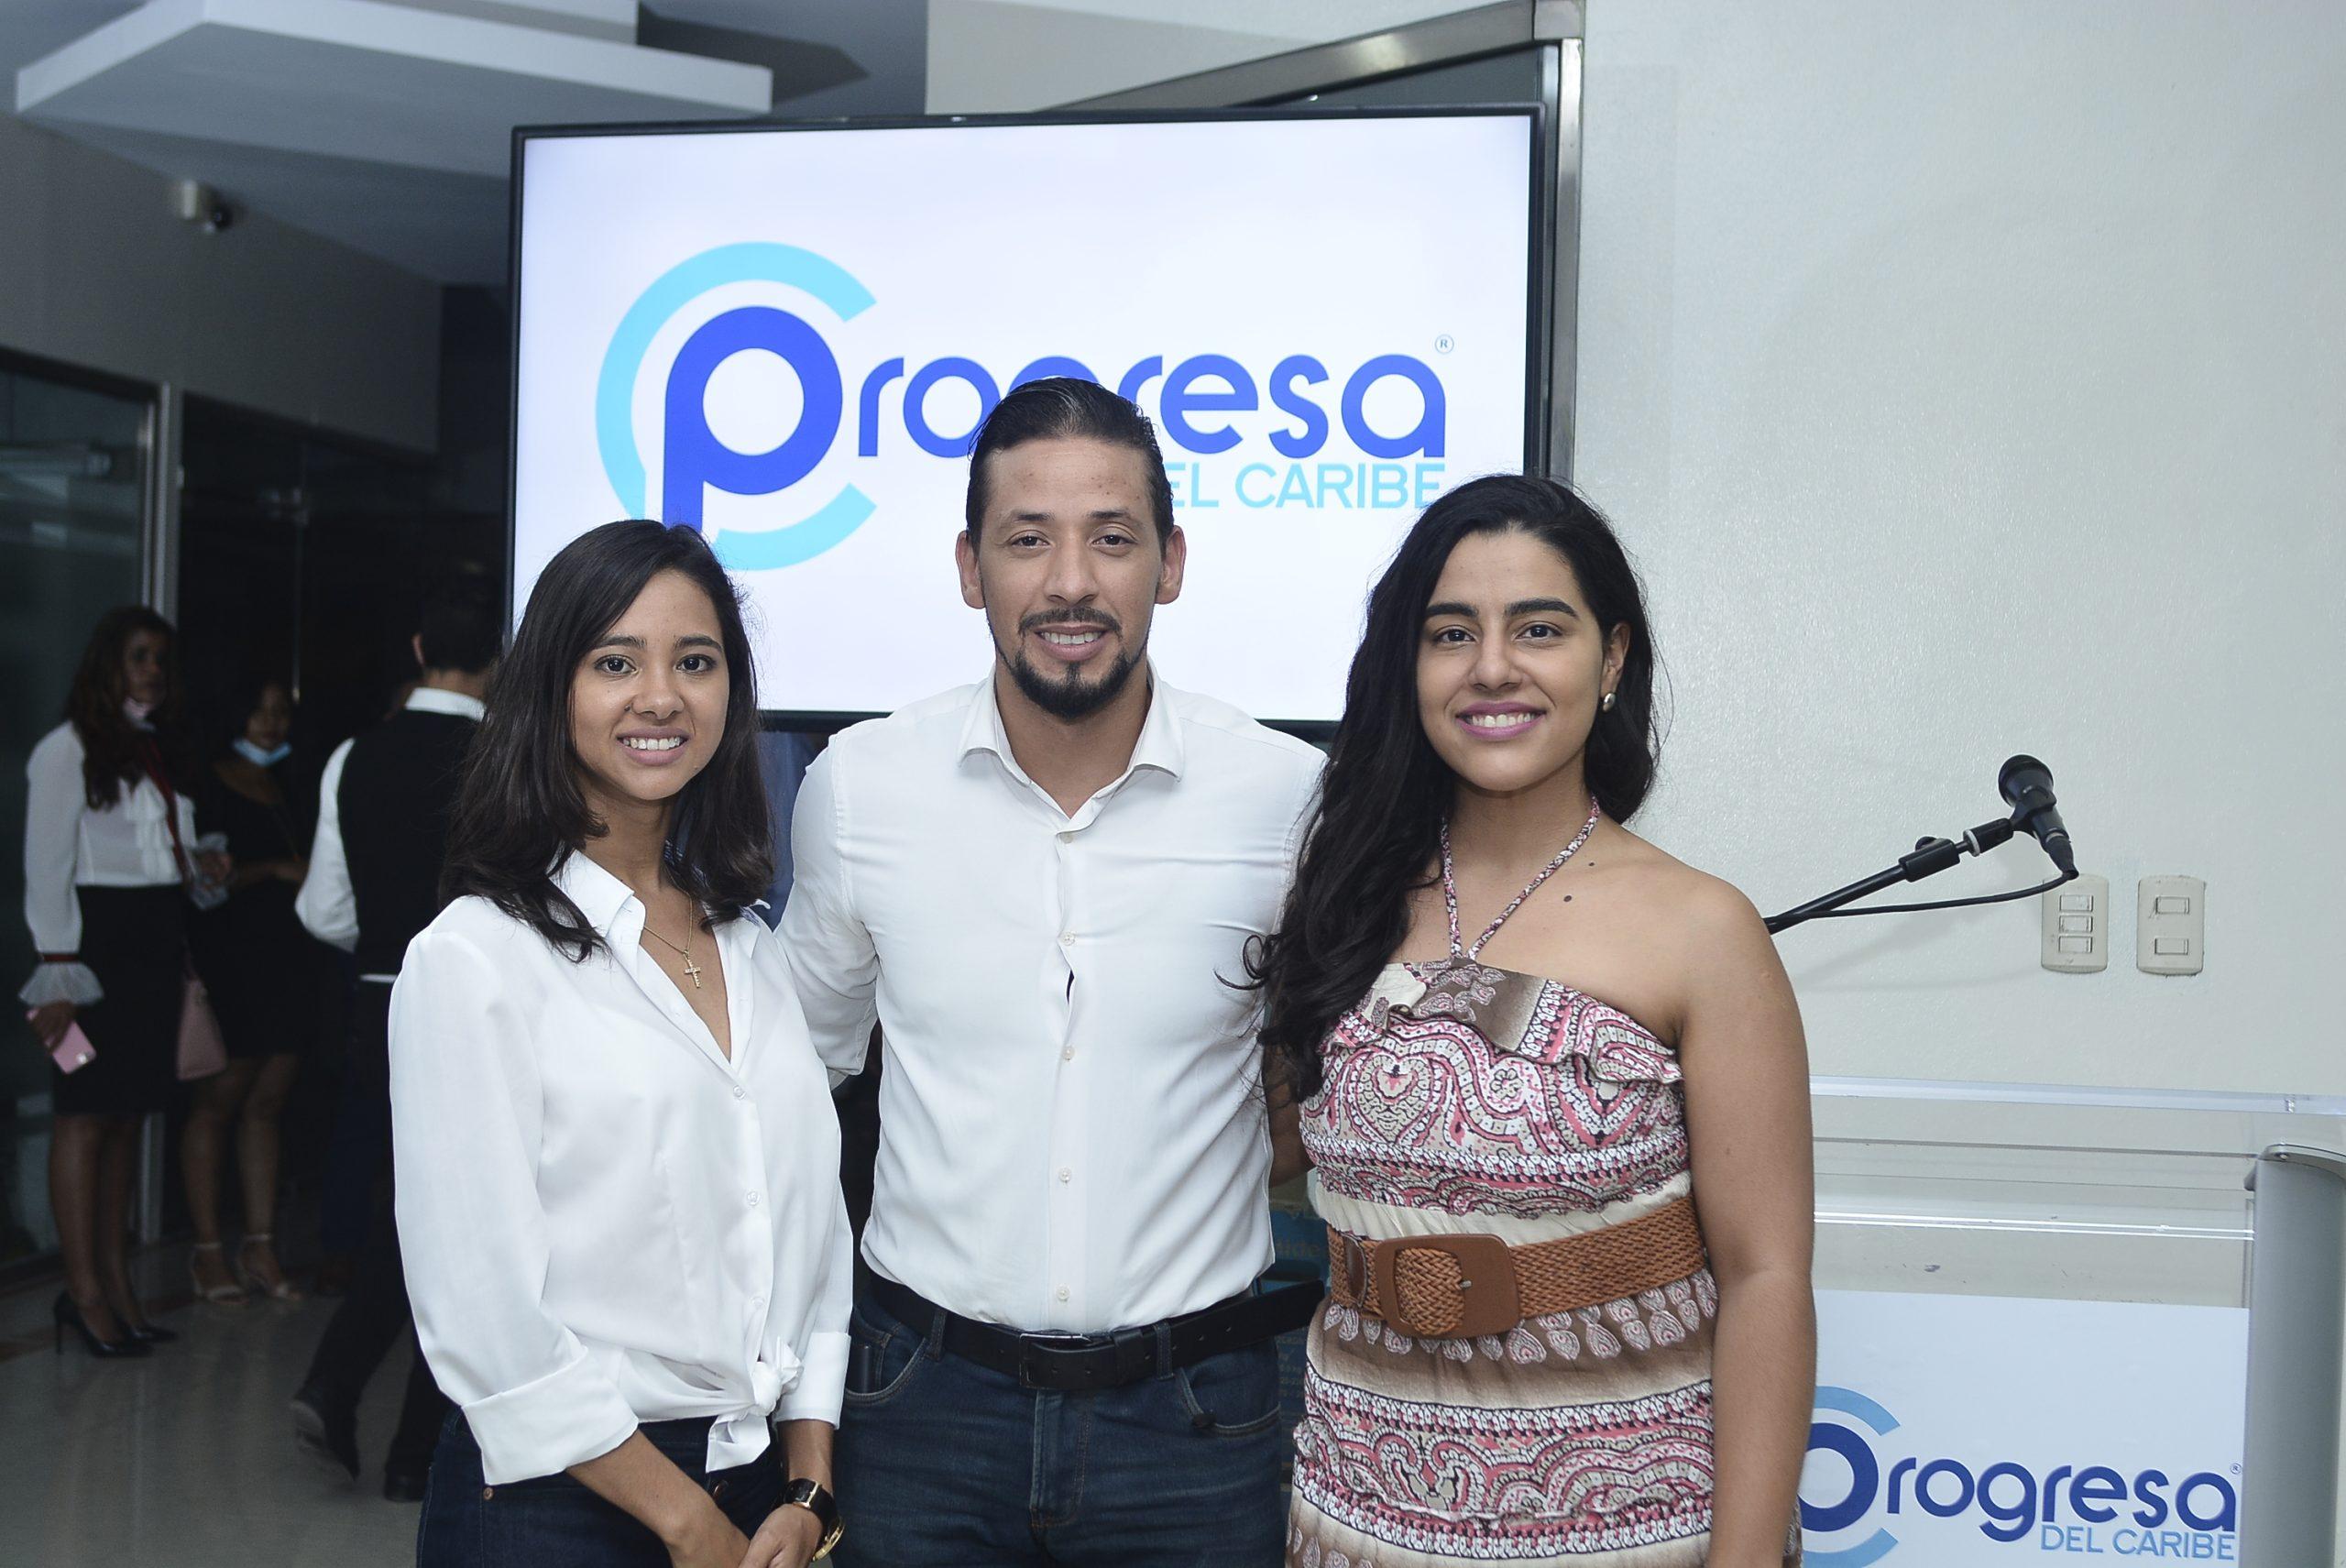 Jeannette Adamez, Javier Taveras y Lucia Medina